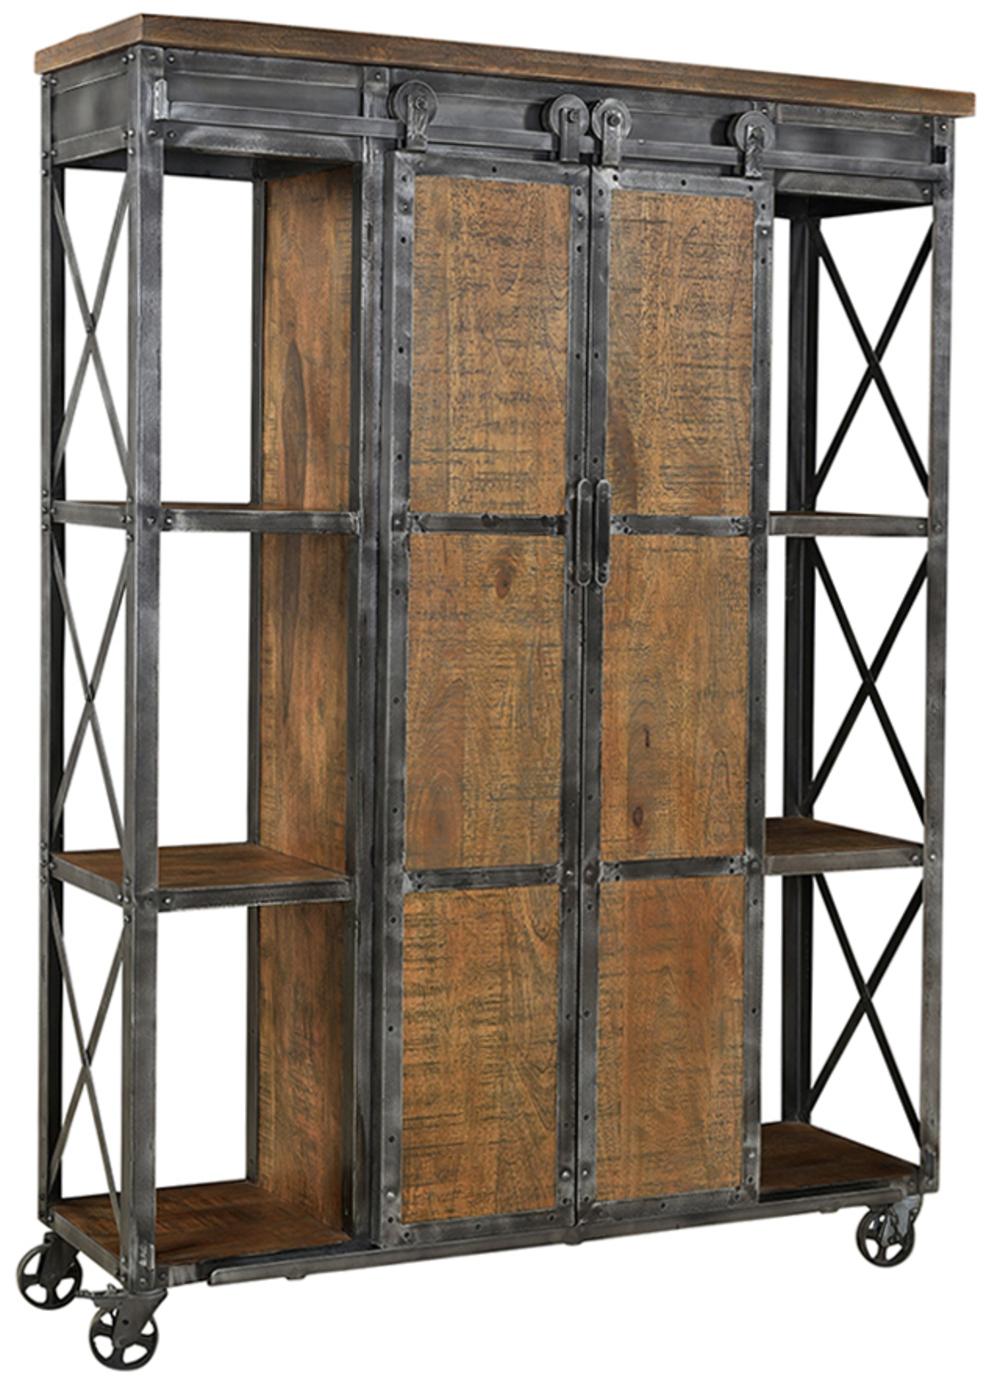 Dovetail Furniture - Delano Shelving Cabinet